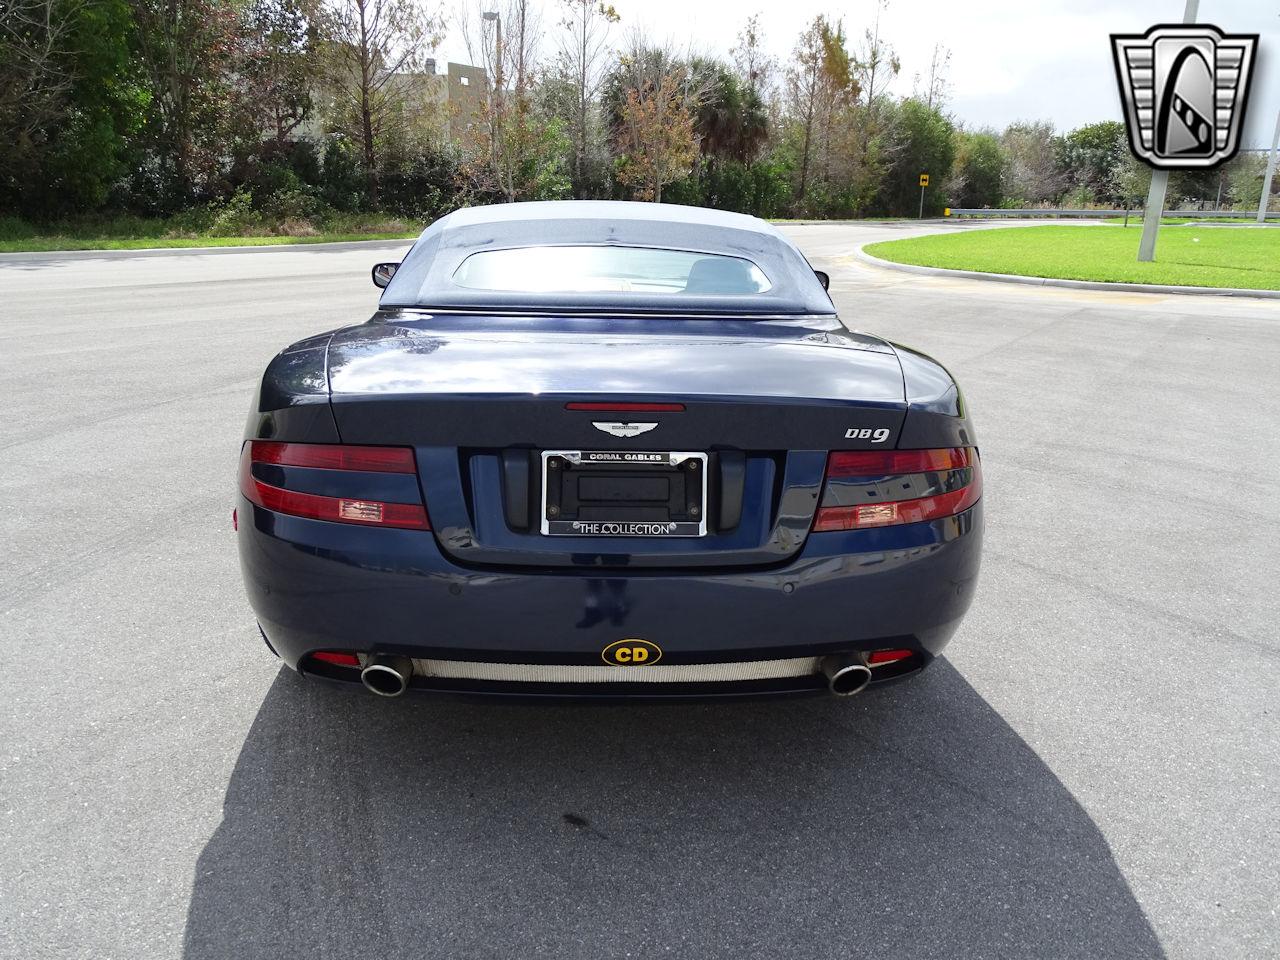 2006 Aston Martin DB9 4